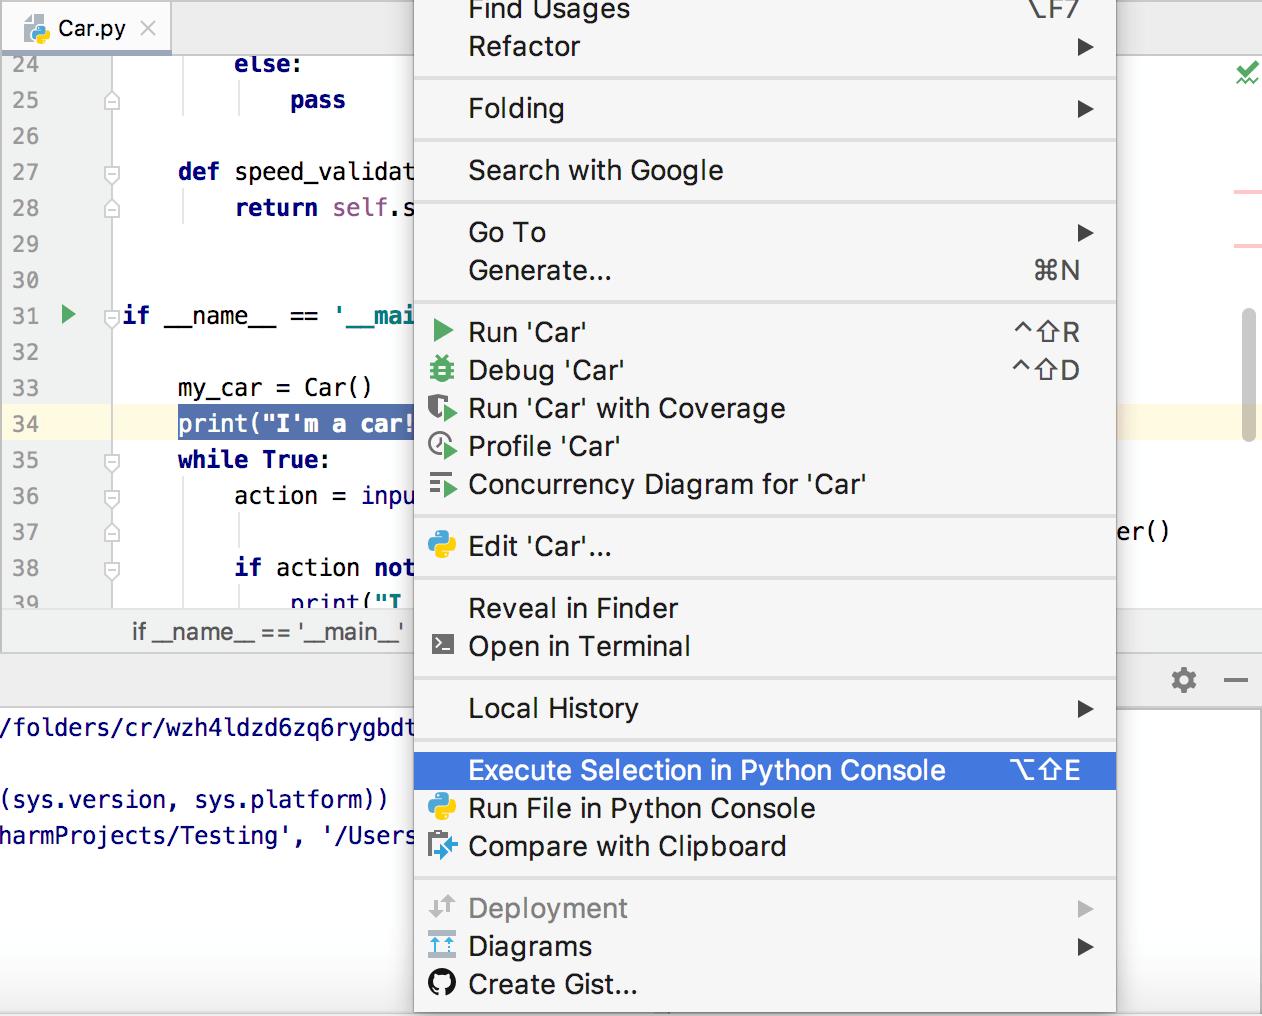 Context menu for executing the code selection